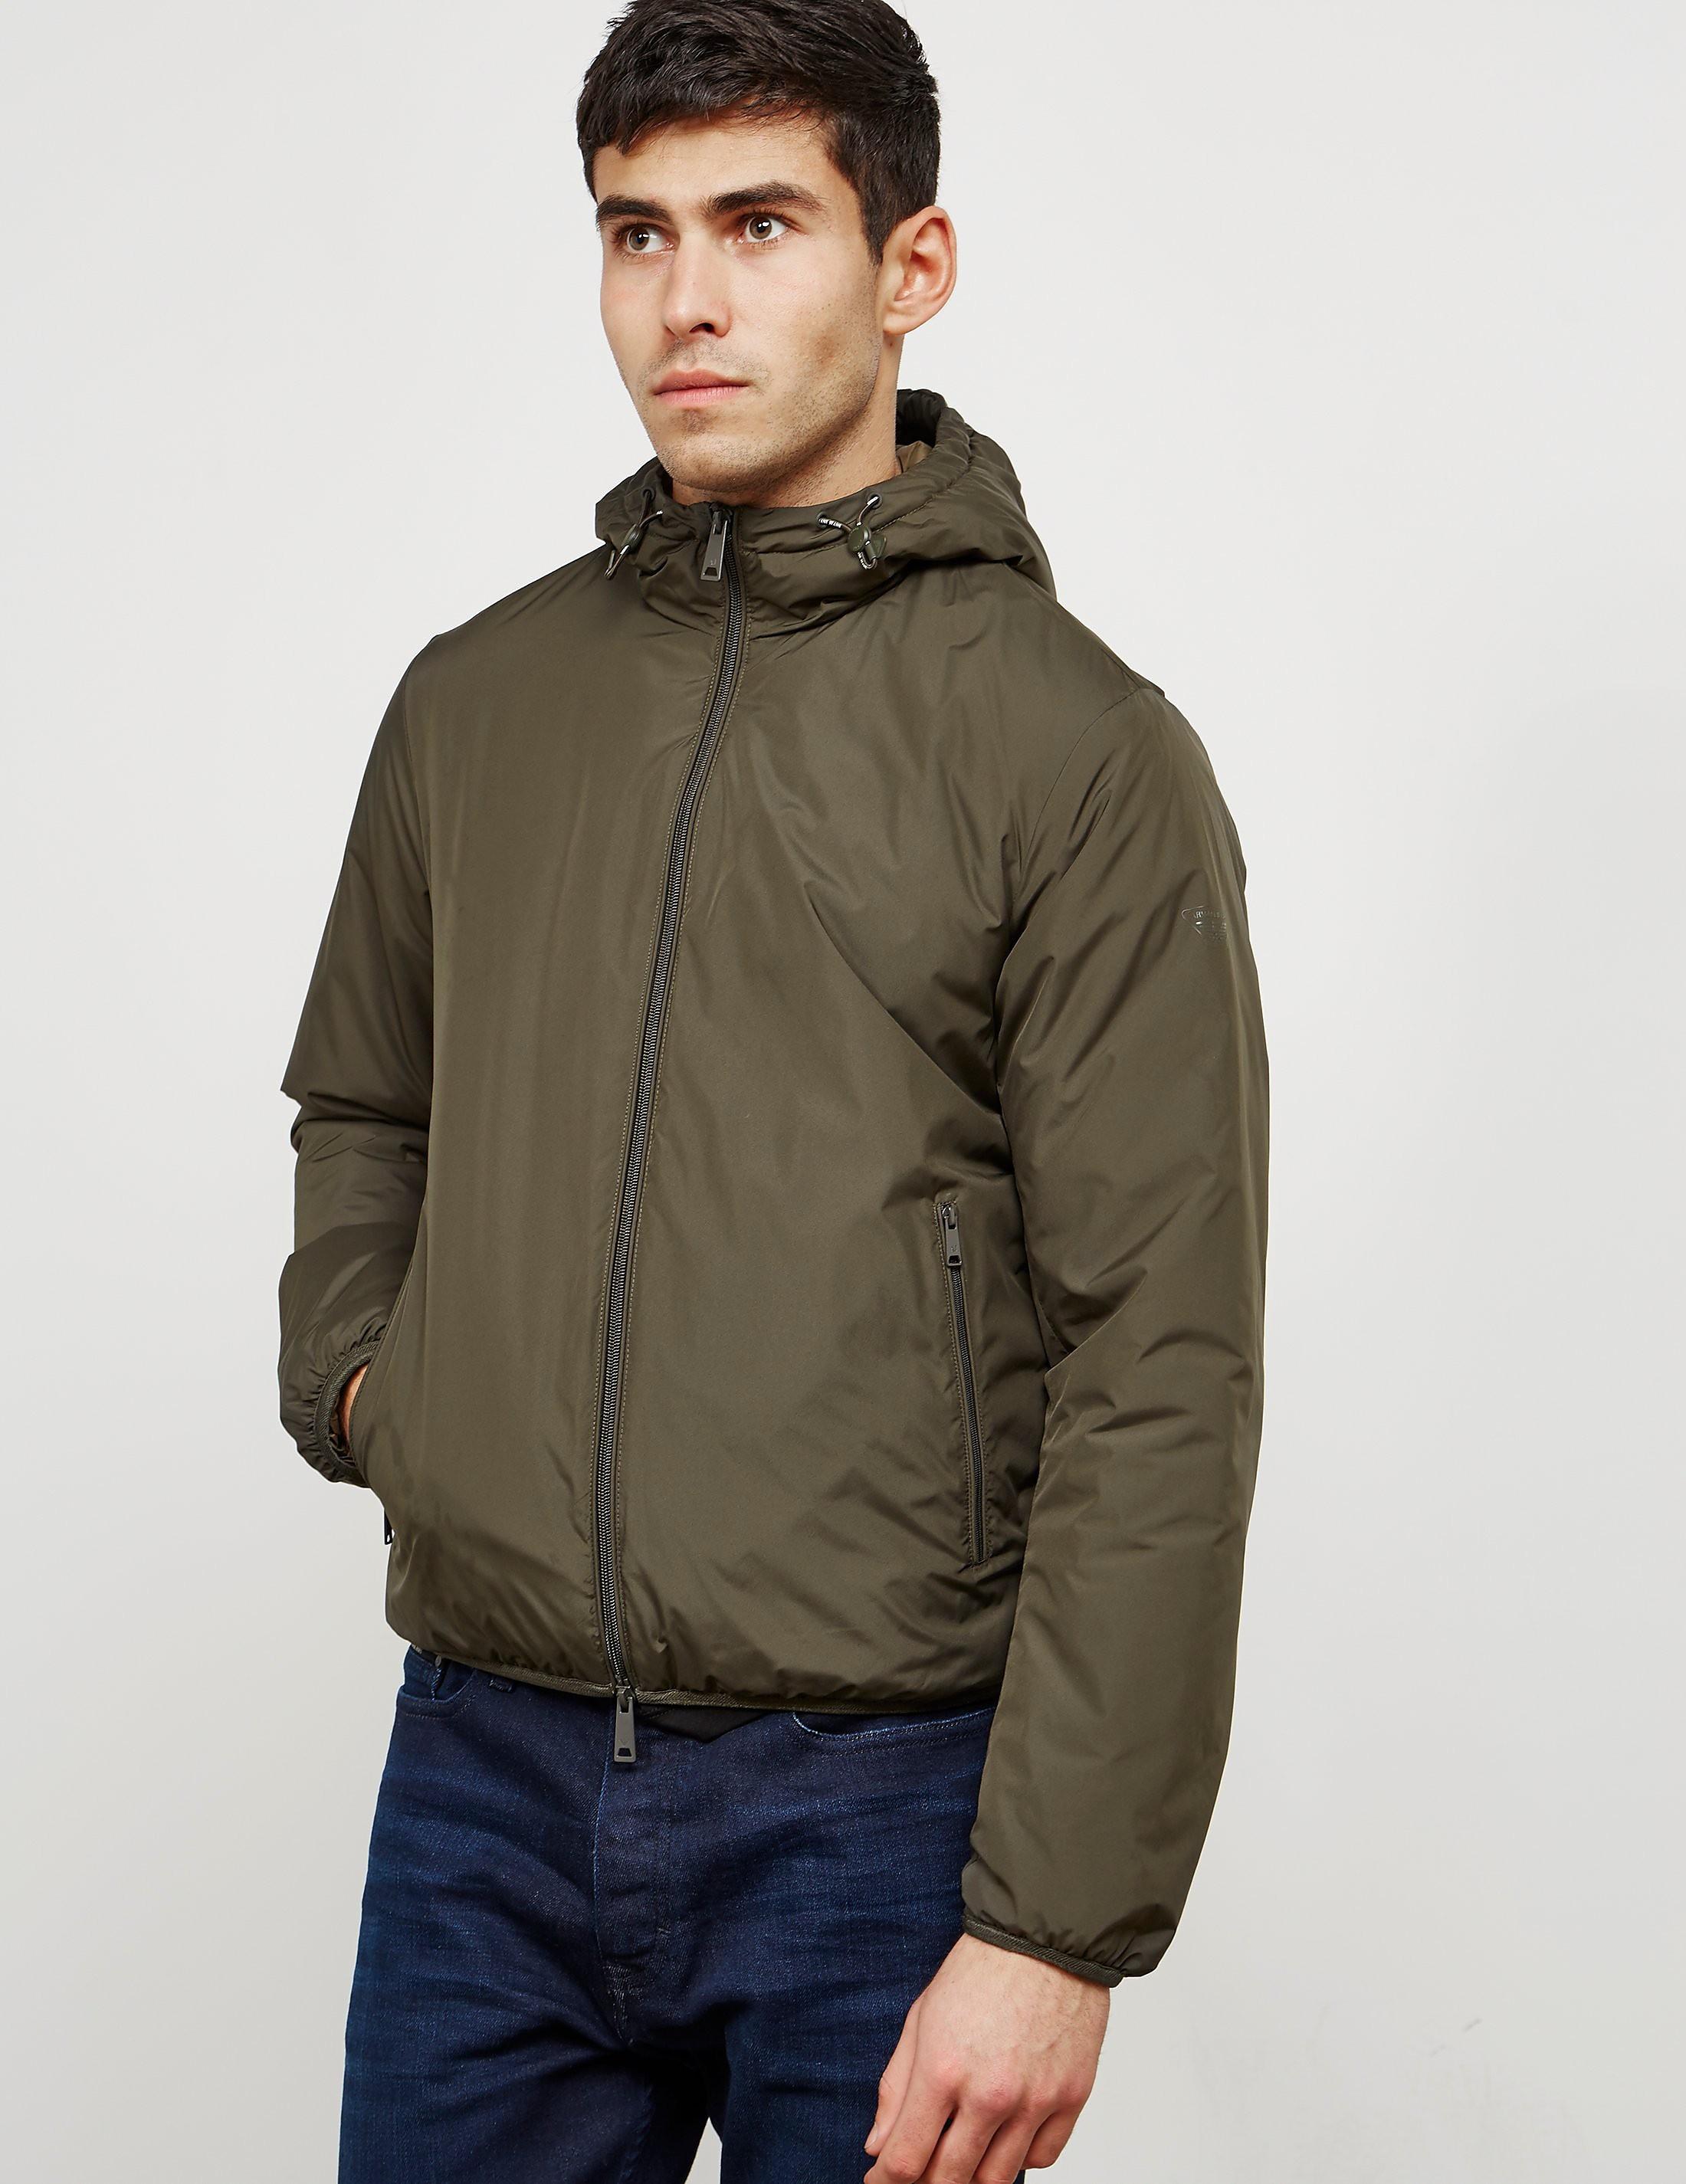 Armani Jeans Blouson Jacket